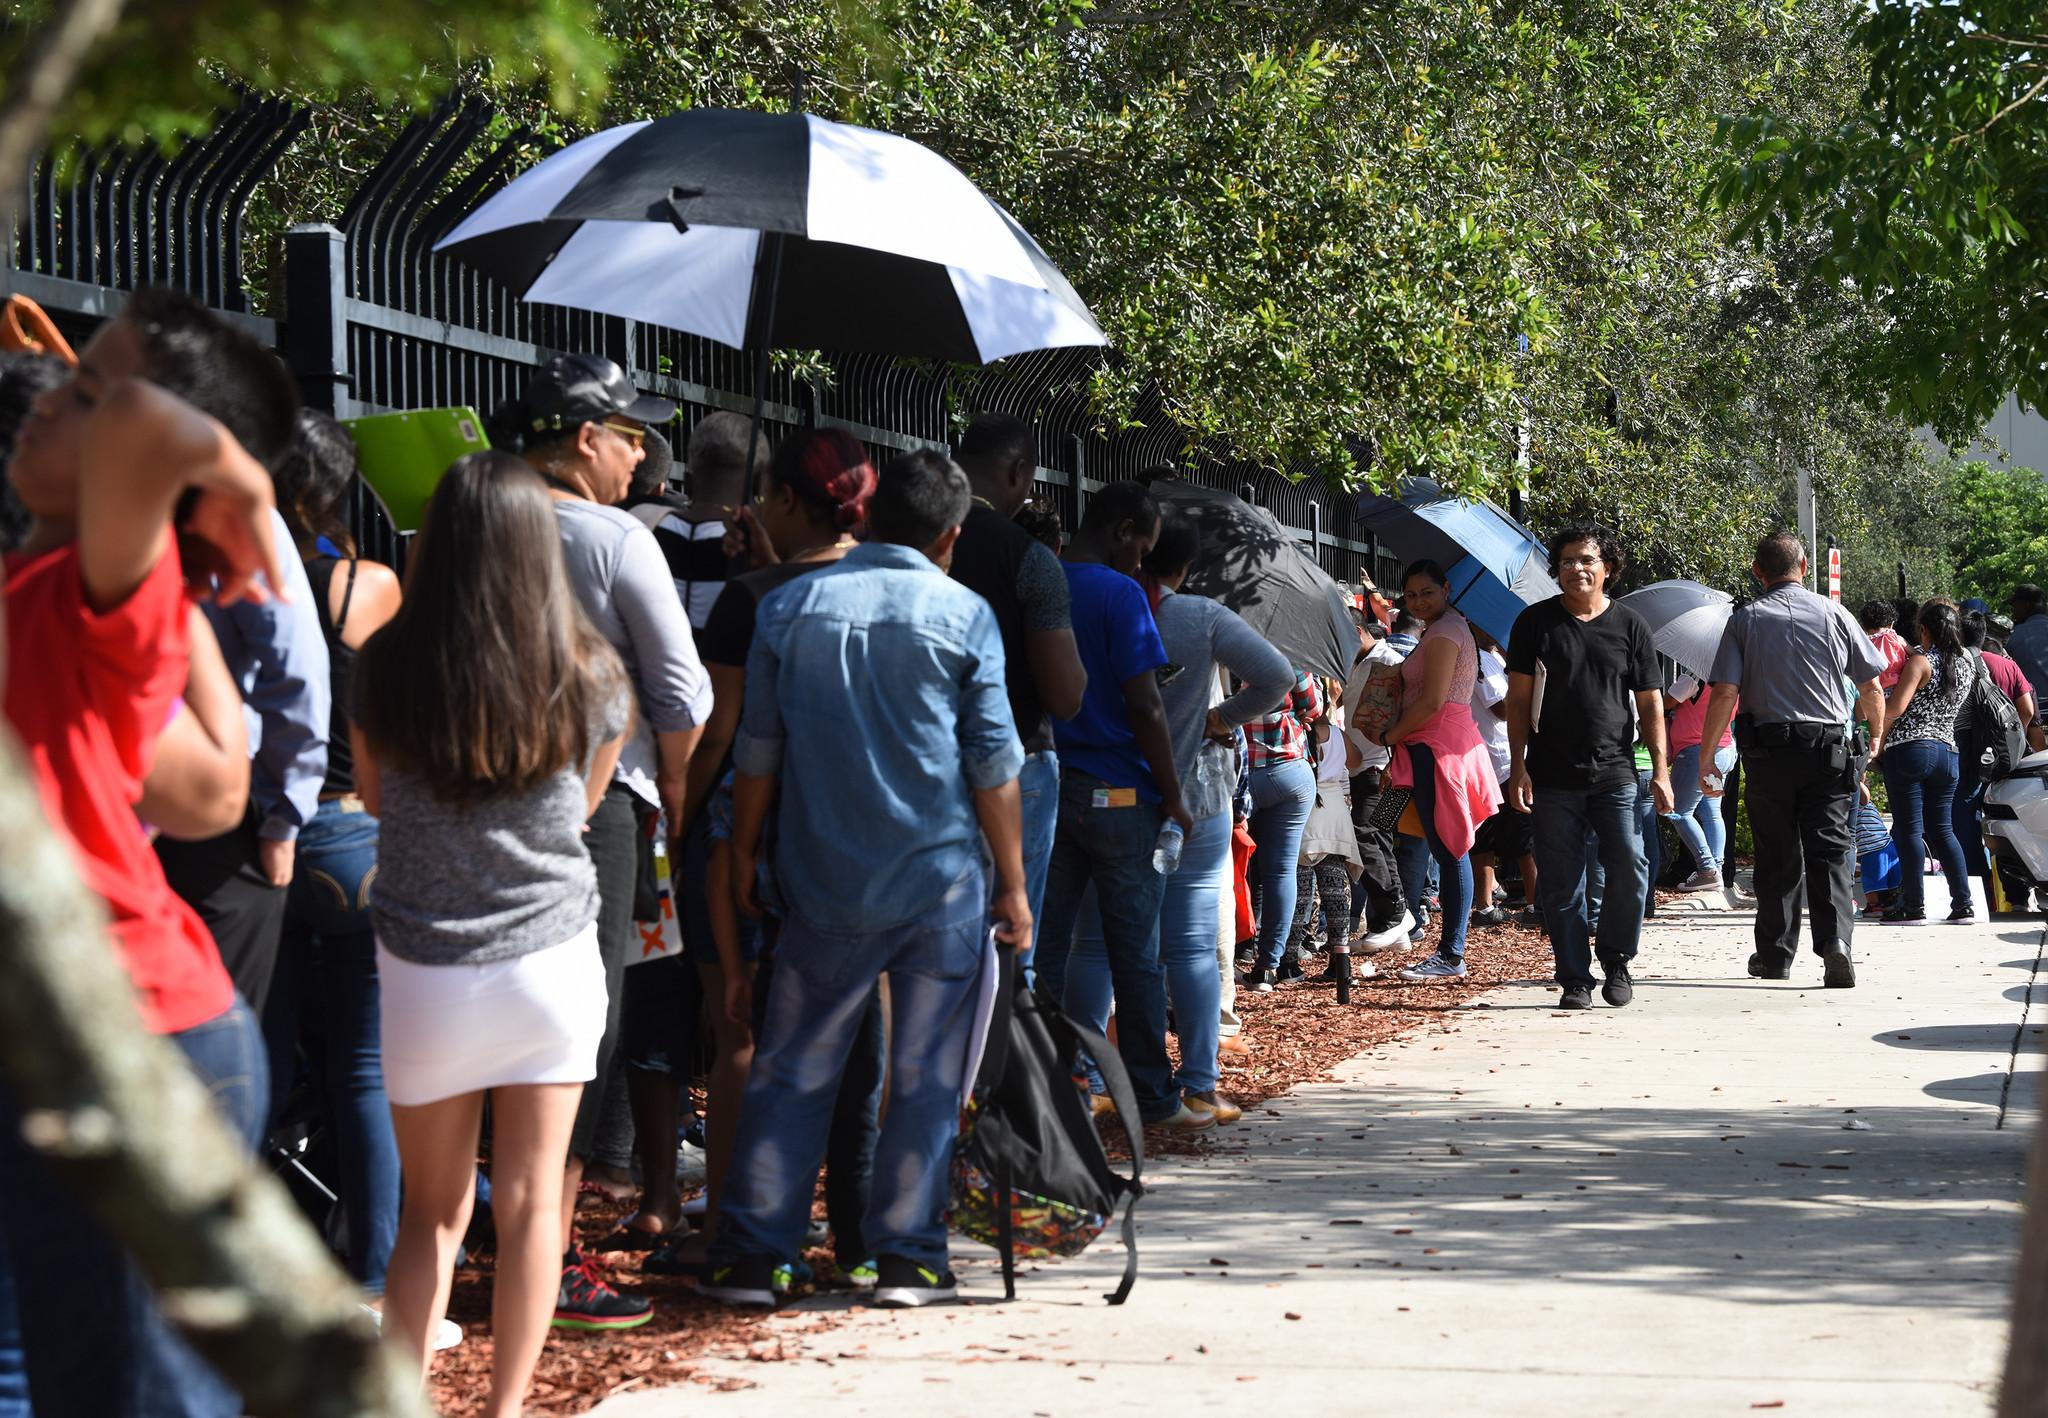 ACLU warns people not to travel to Florida if Legislature passes sanctuary city ban